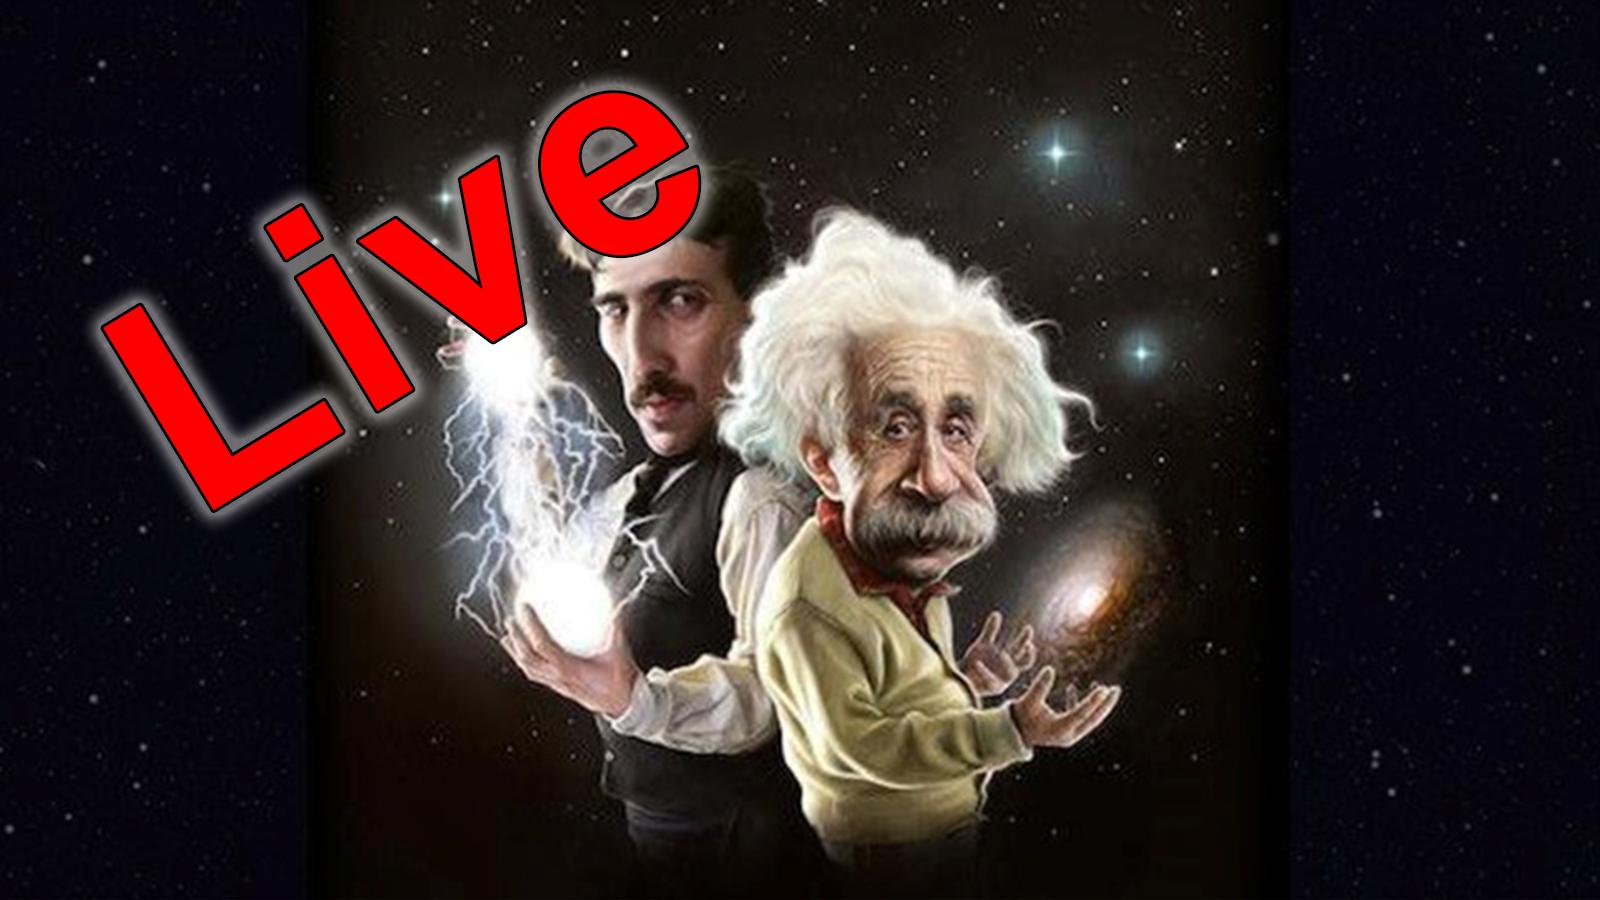 LIVE Η Φυσική Μαγεύει με διαδικτυακές συναντήσεις 13 Φεβρουαρίου 2021